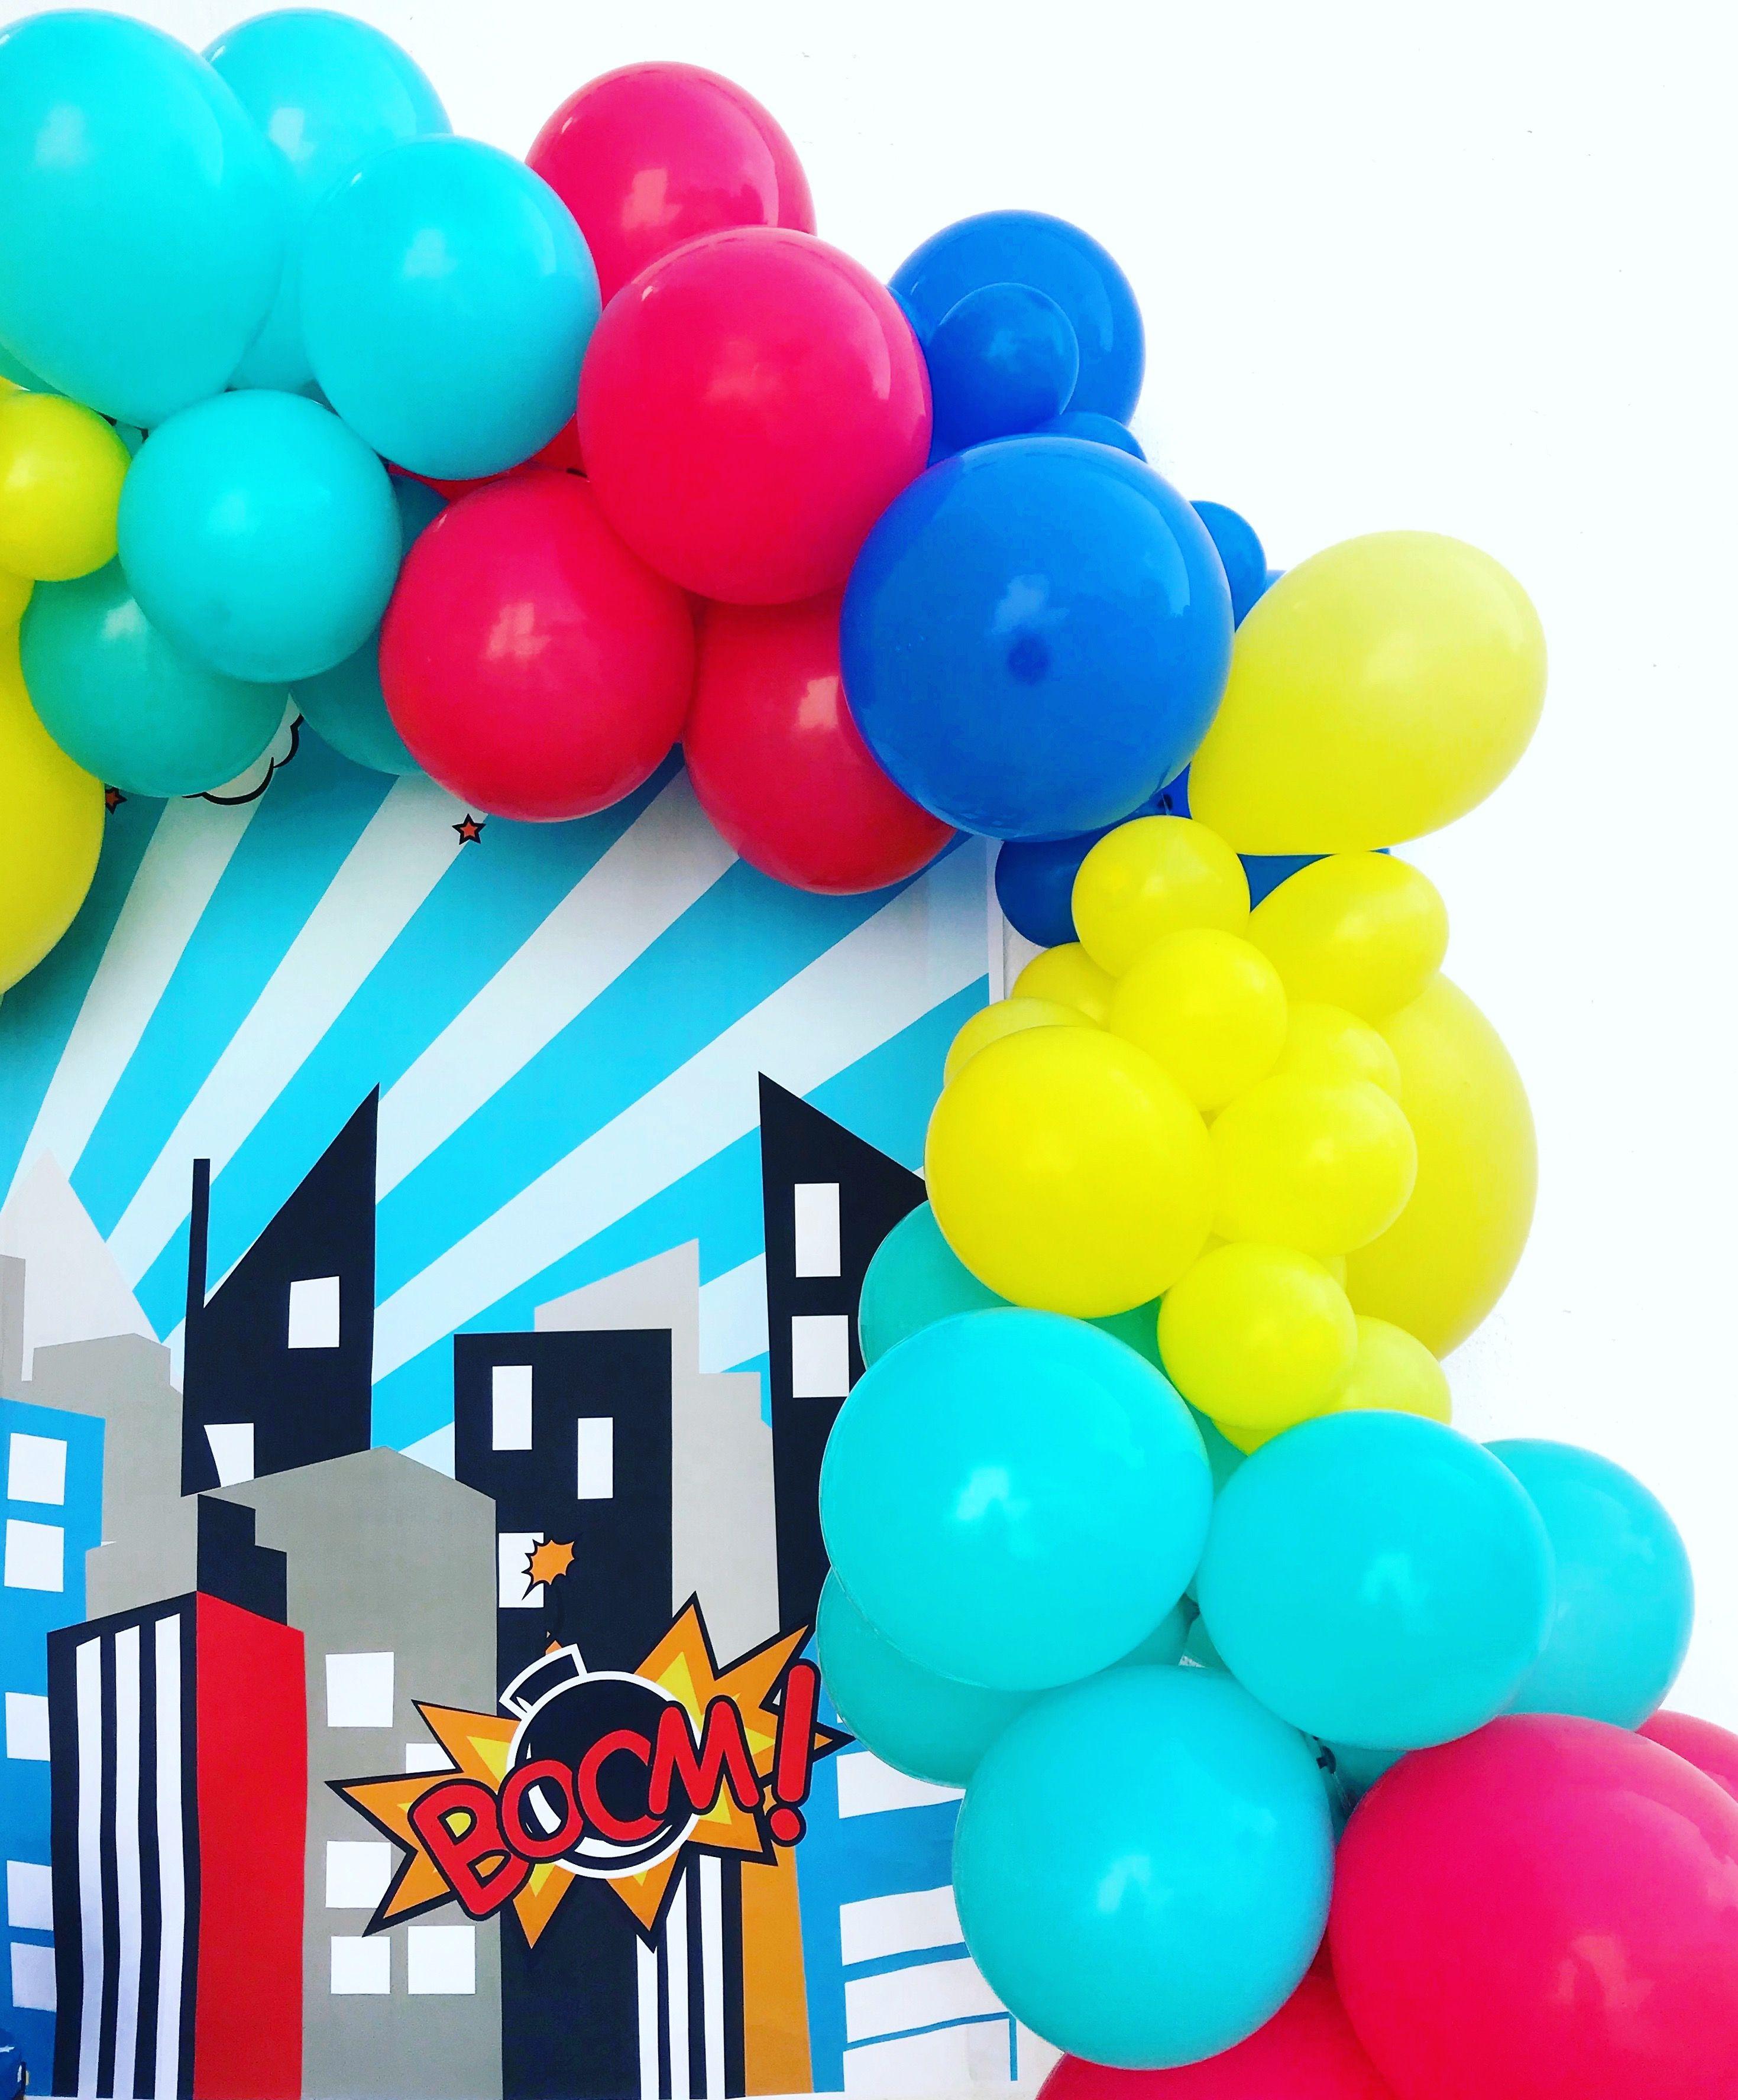 Superhero Party Birthday Balloons Jpg 2939x3552 Safeway Cupcake